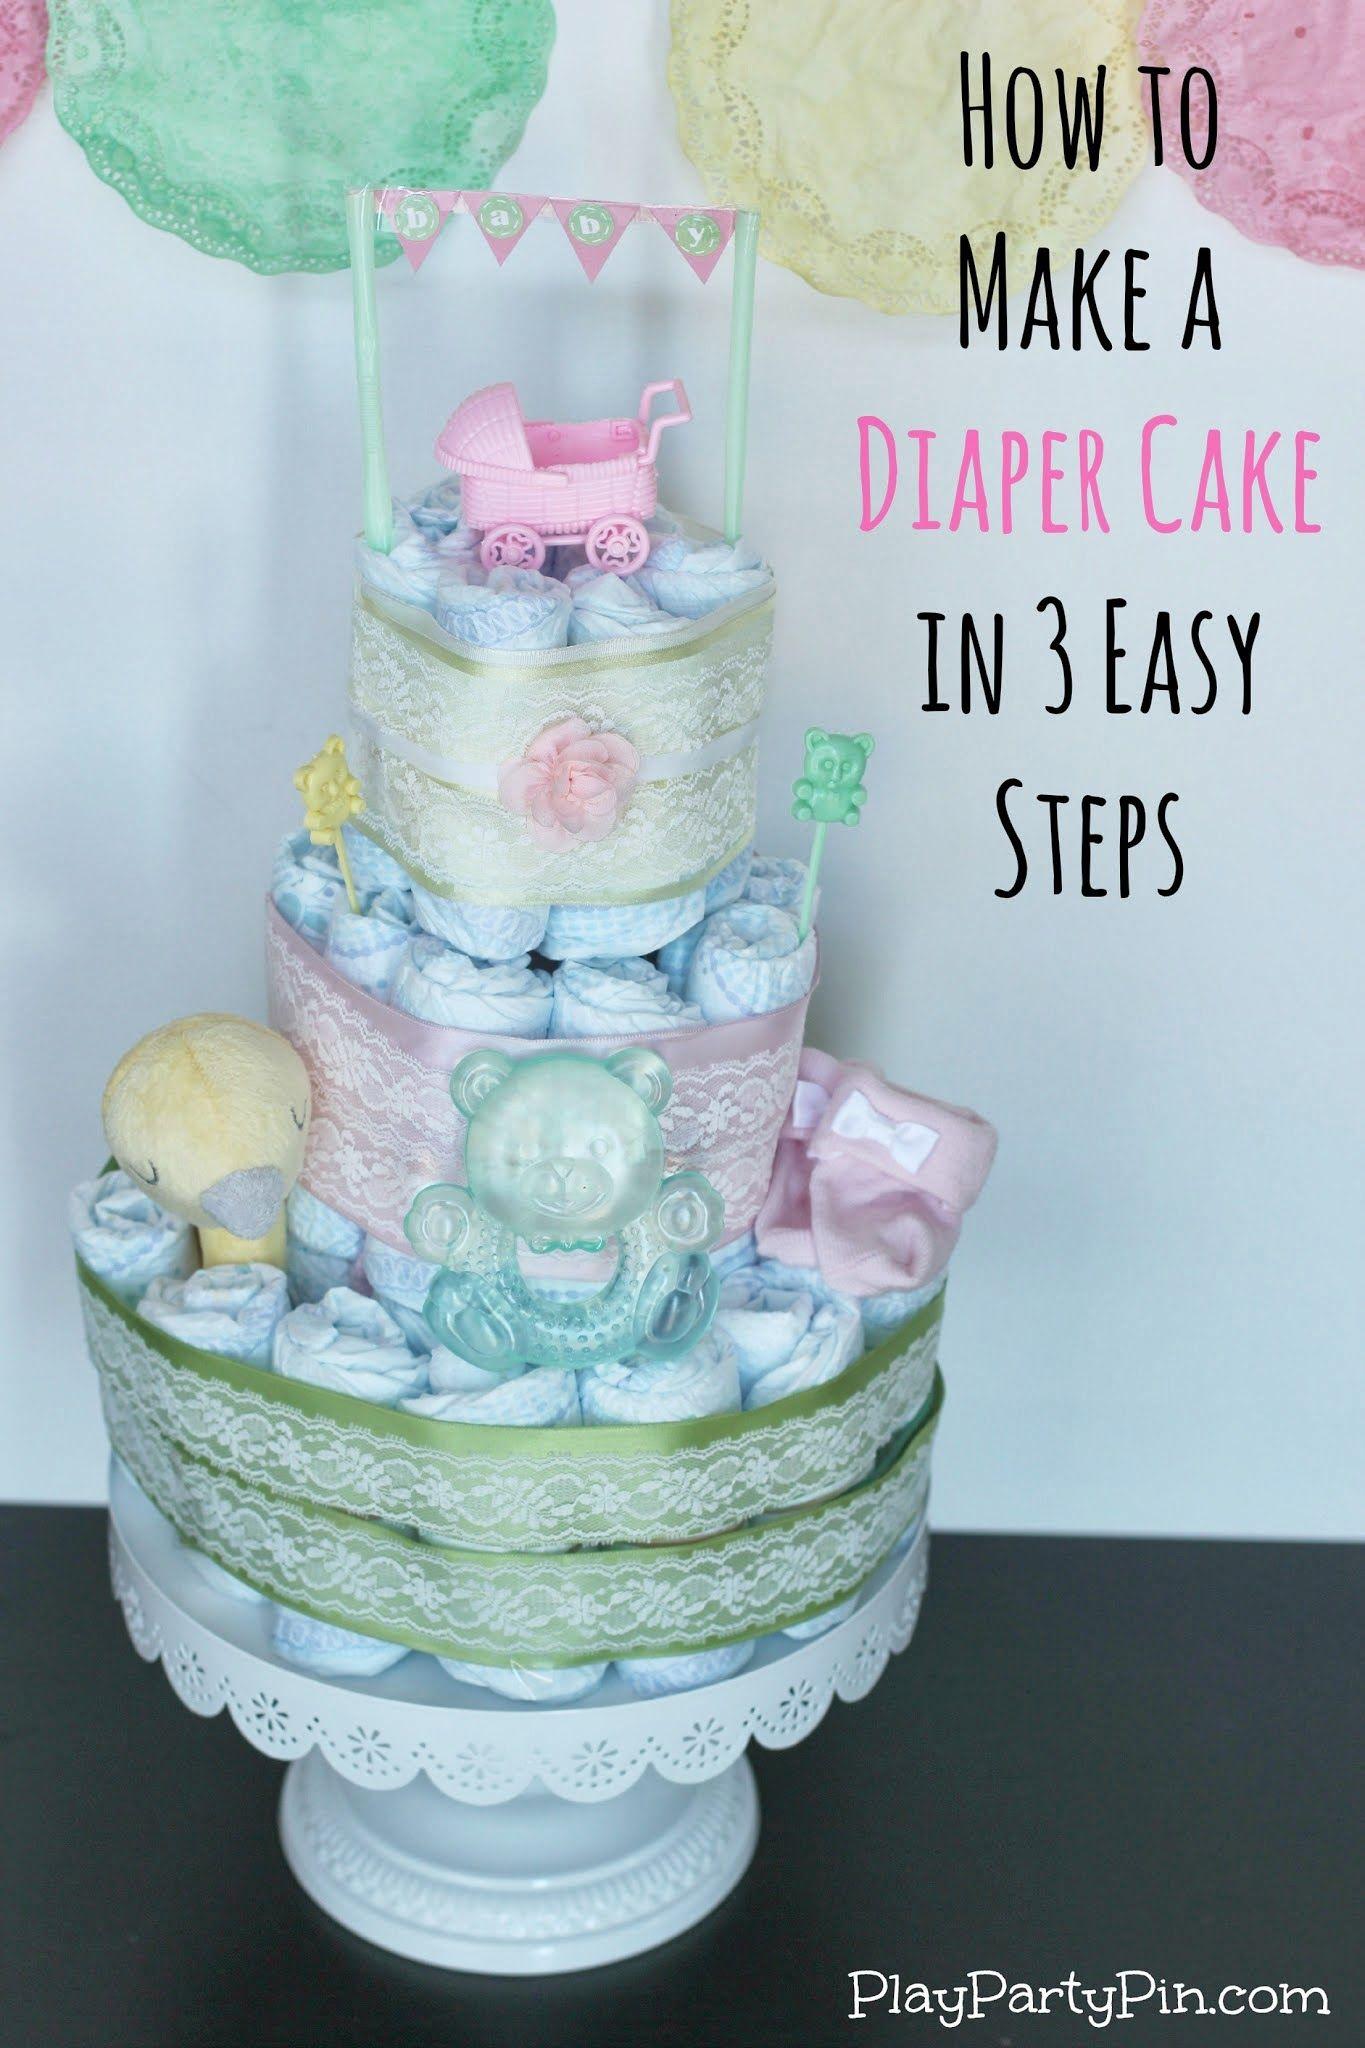 Simple 3 Step Tutorial To Make A Cute Diaper Cake